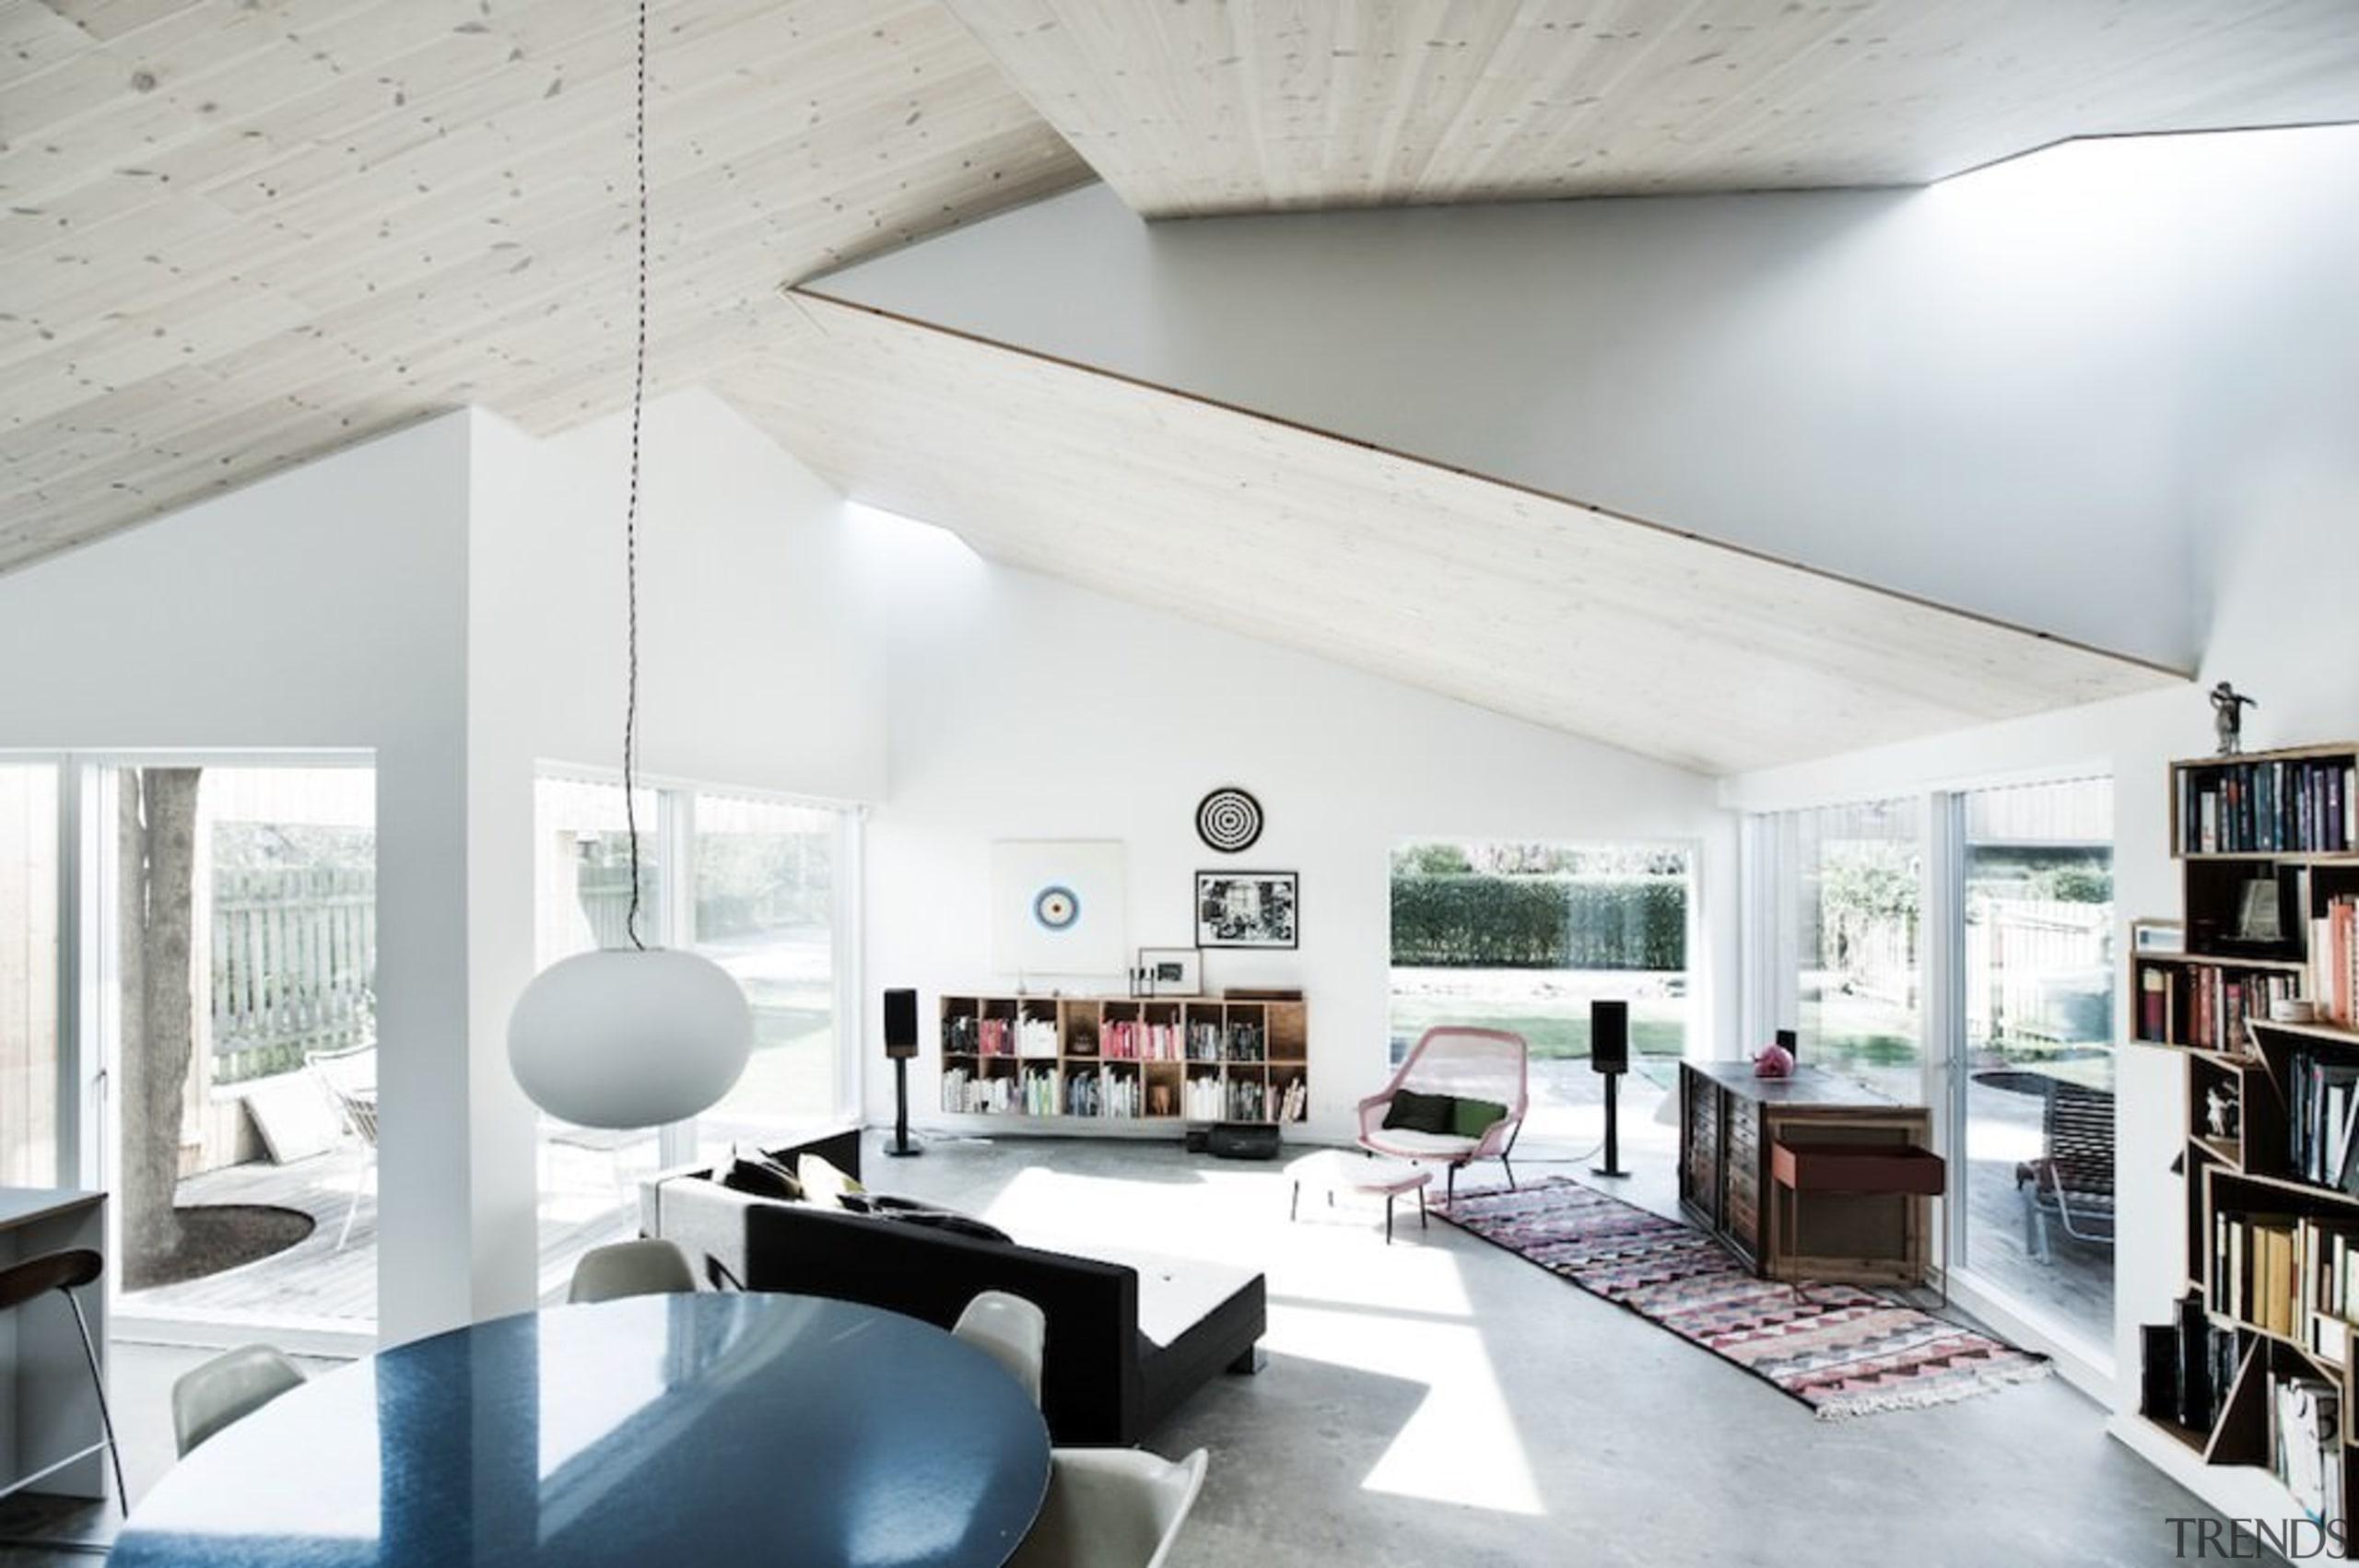 Architect: Sigured LarsenPhotography by Tia Borgsmidt architecture, ceiling, daylighting, house, interior design, living room, loft, white